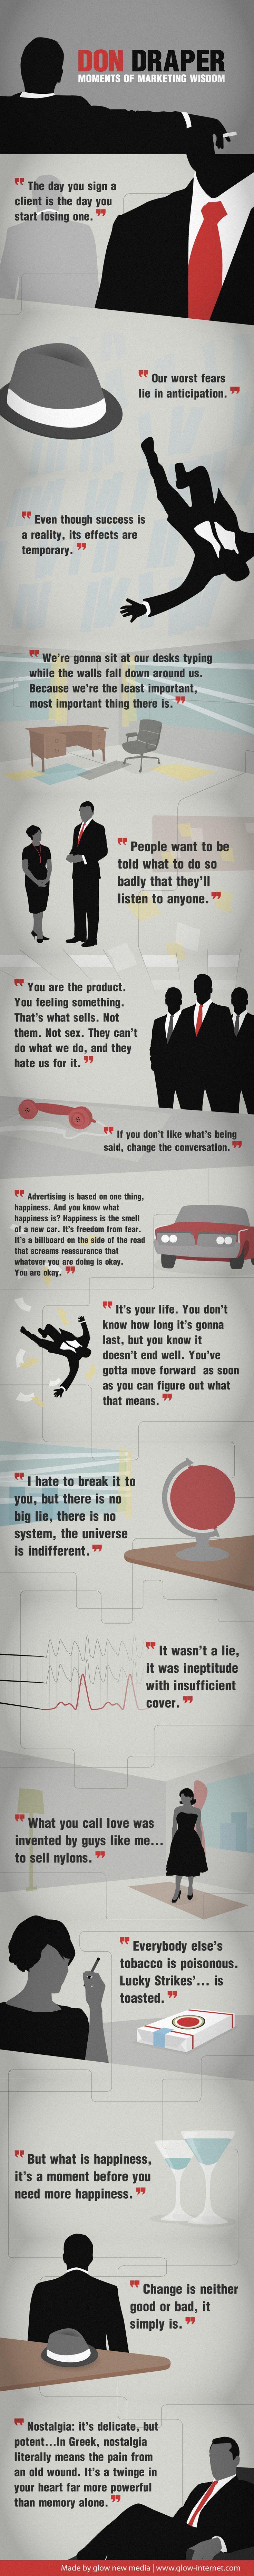 Don Draper Moments of Marketing Wisdom